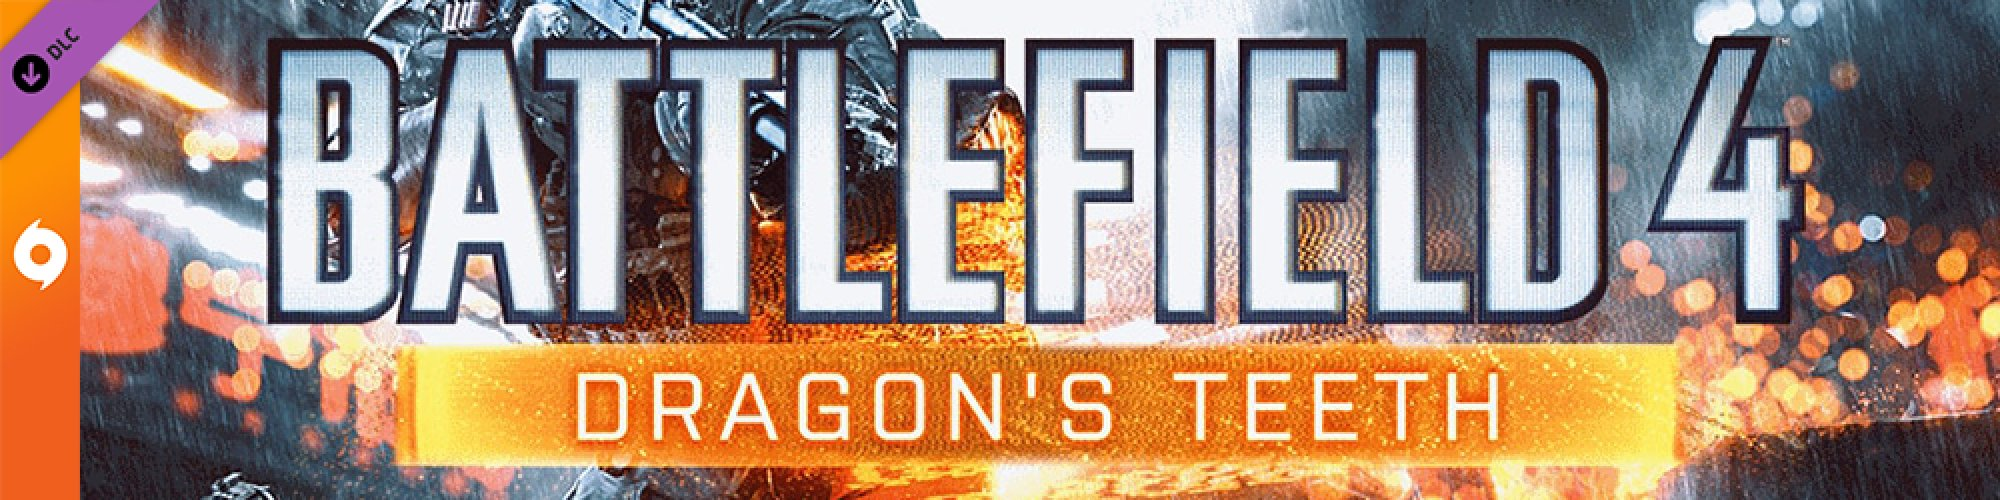 Battlefield 4 Dragons Teeth